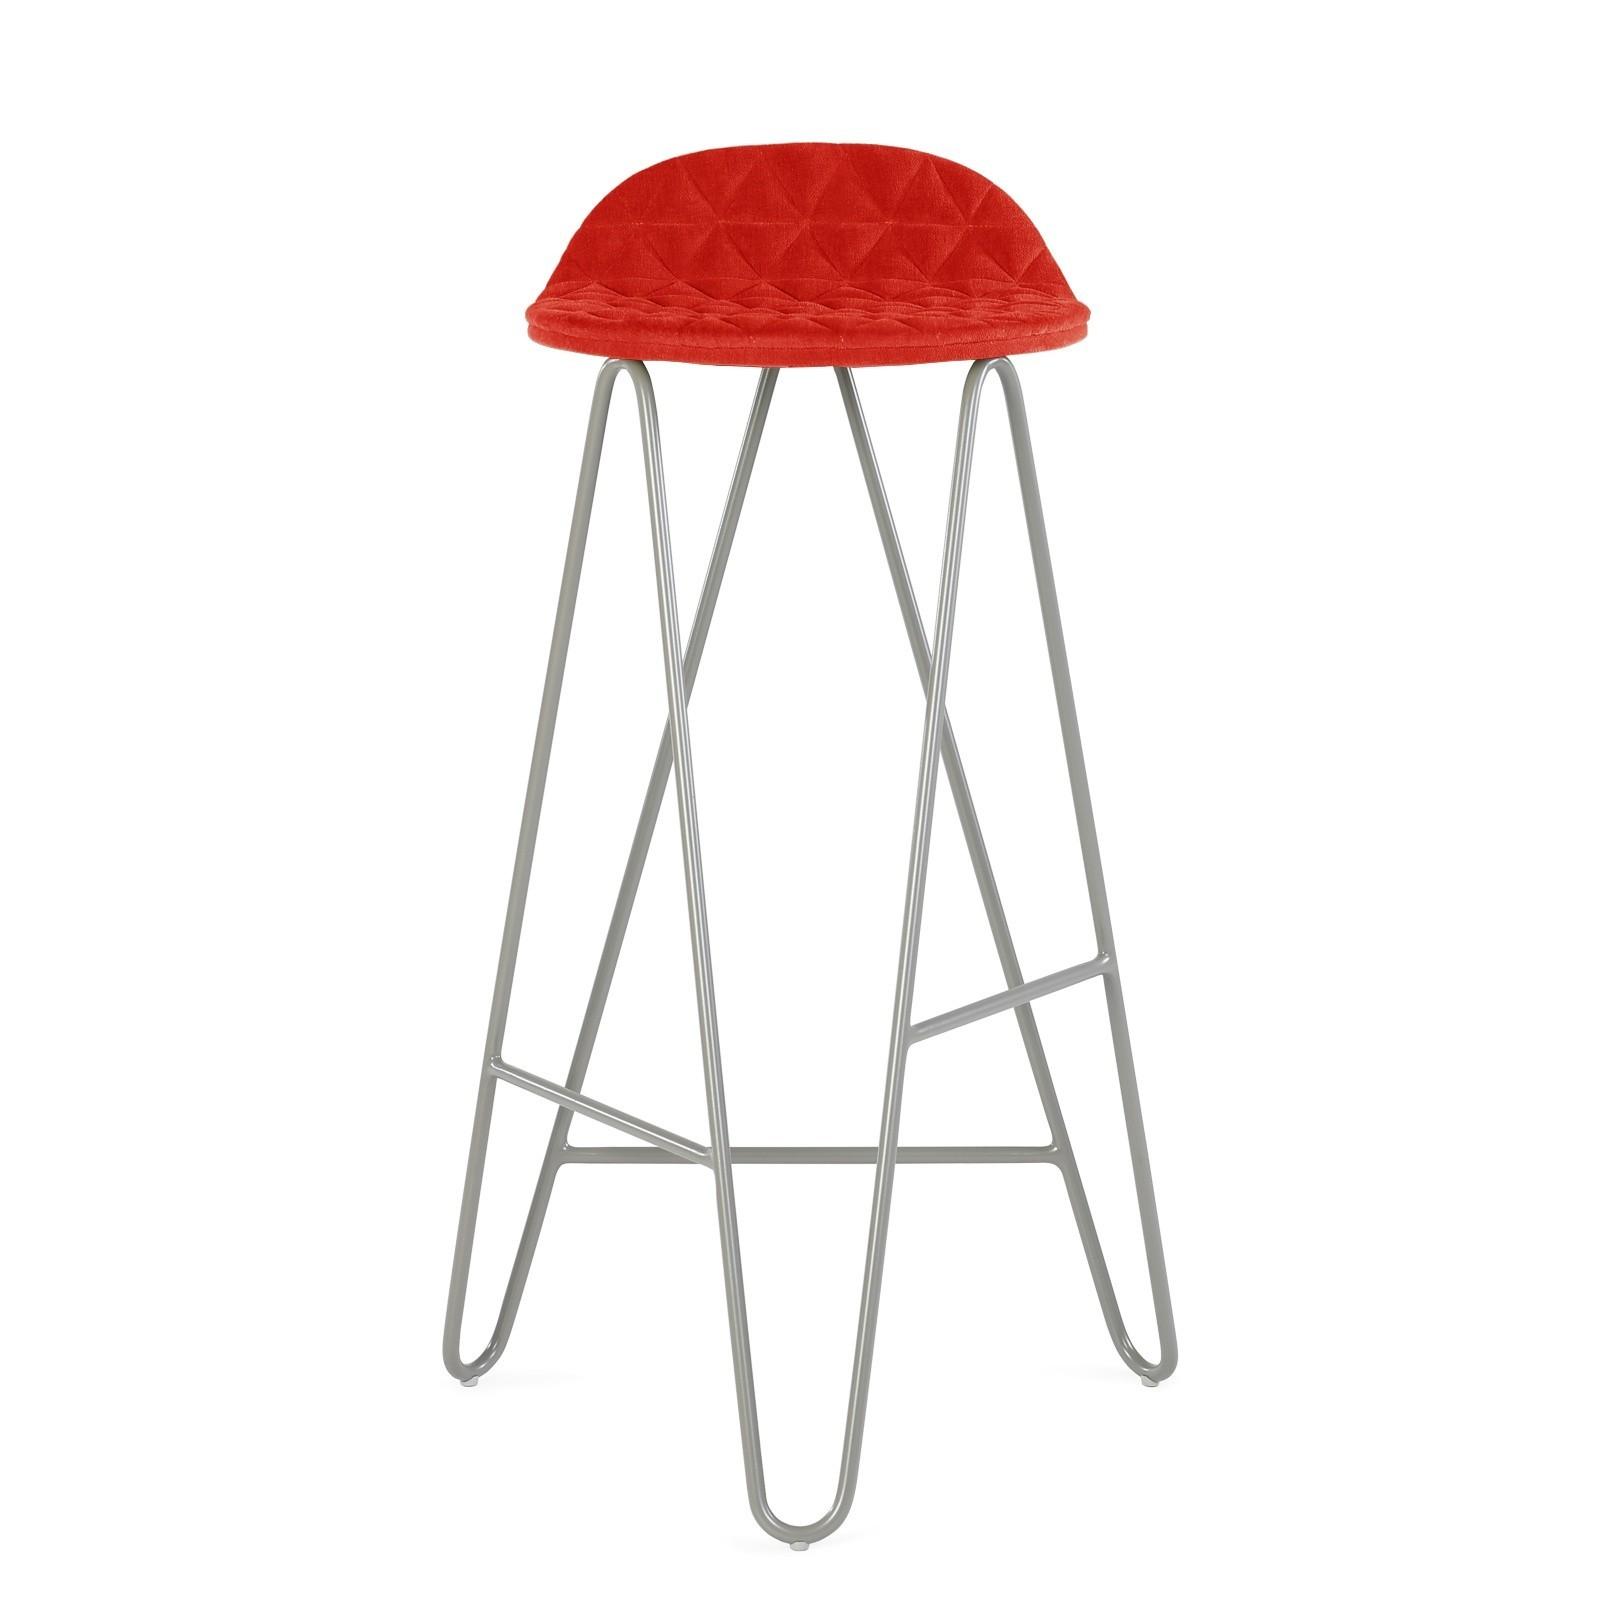 Hoker MannequinBar - 02 - czerwony